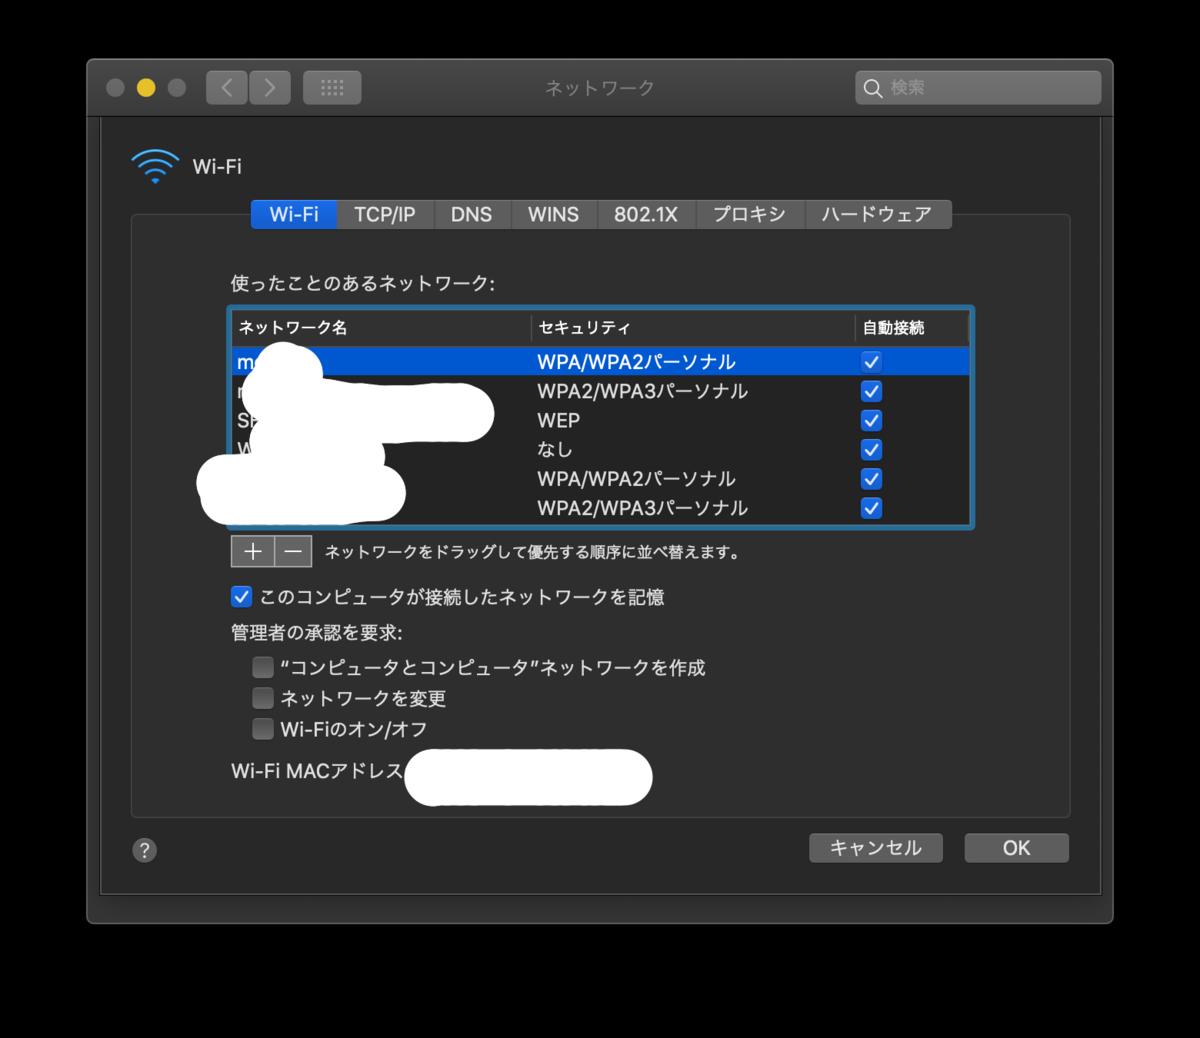 f:id:mon0:20191123135231p:plain